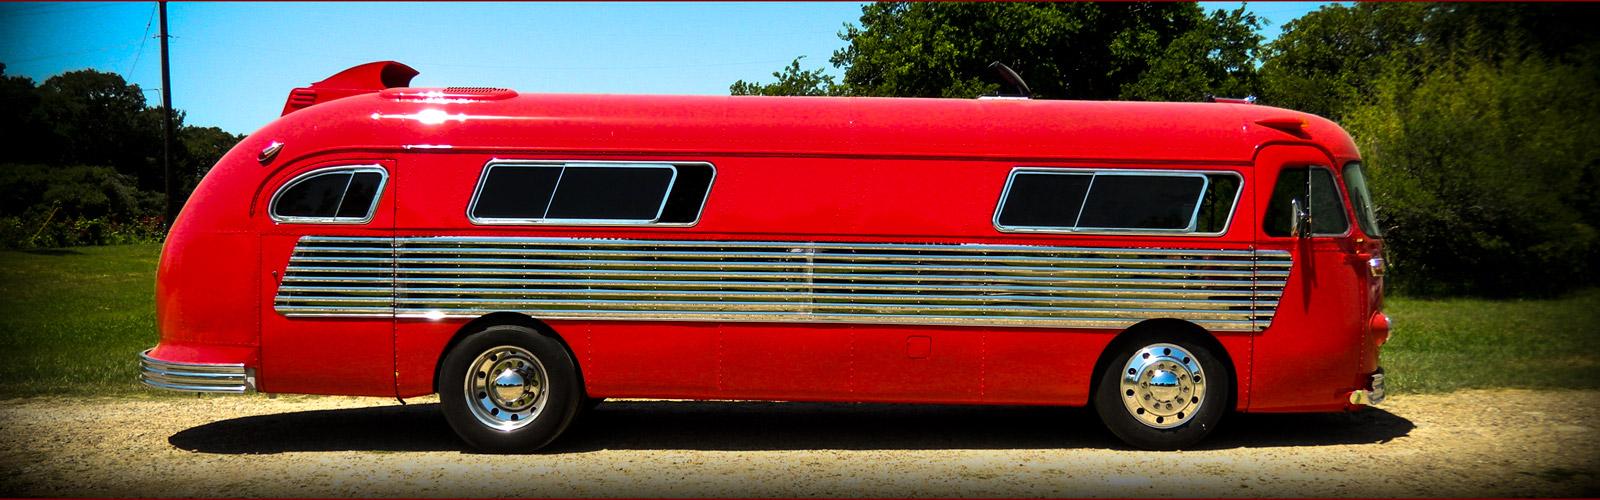 1950 Flex Bus